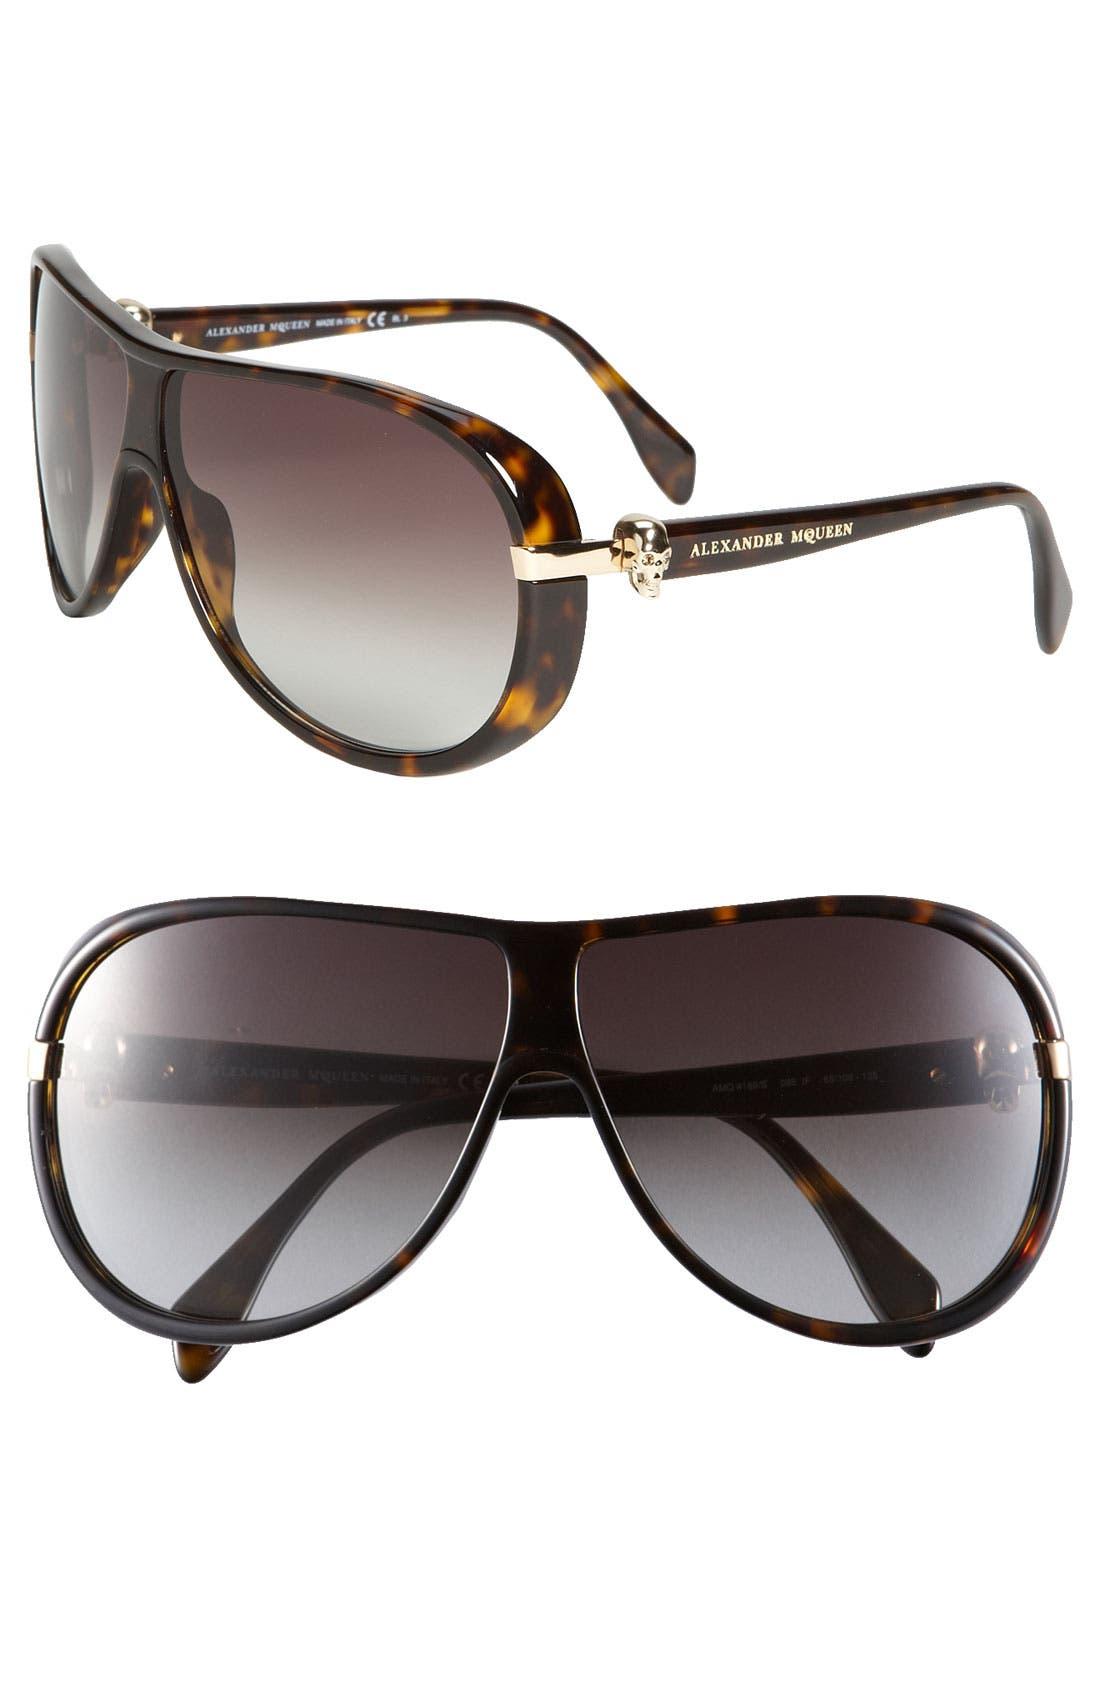 Main Image - Alexander McQueen 65mm Skull Temple Aviator Sunglasses